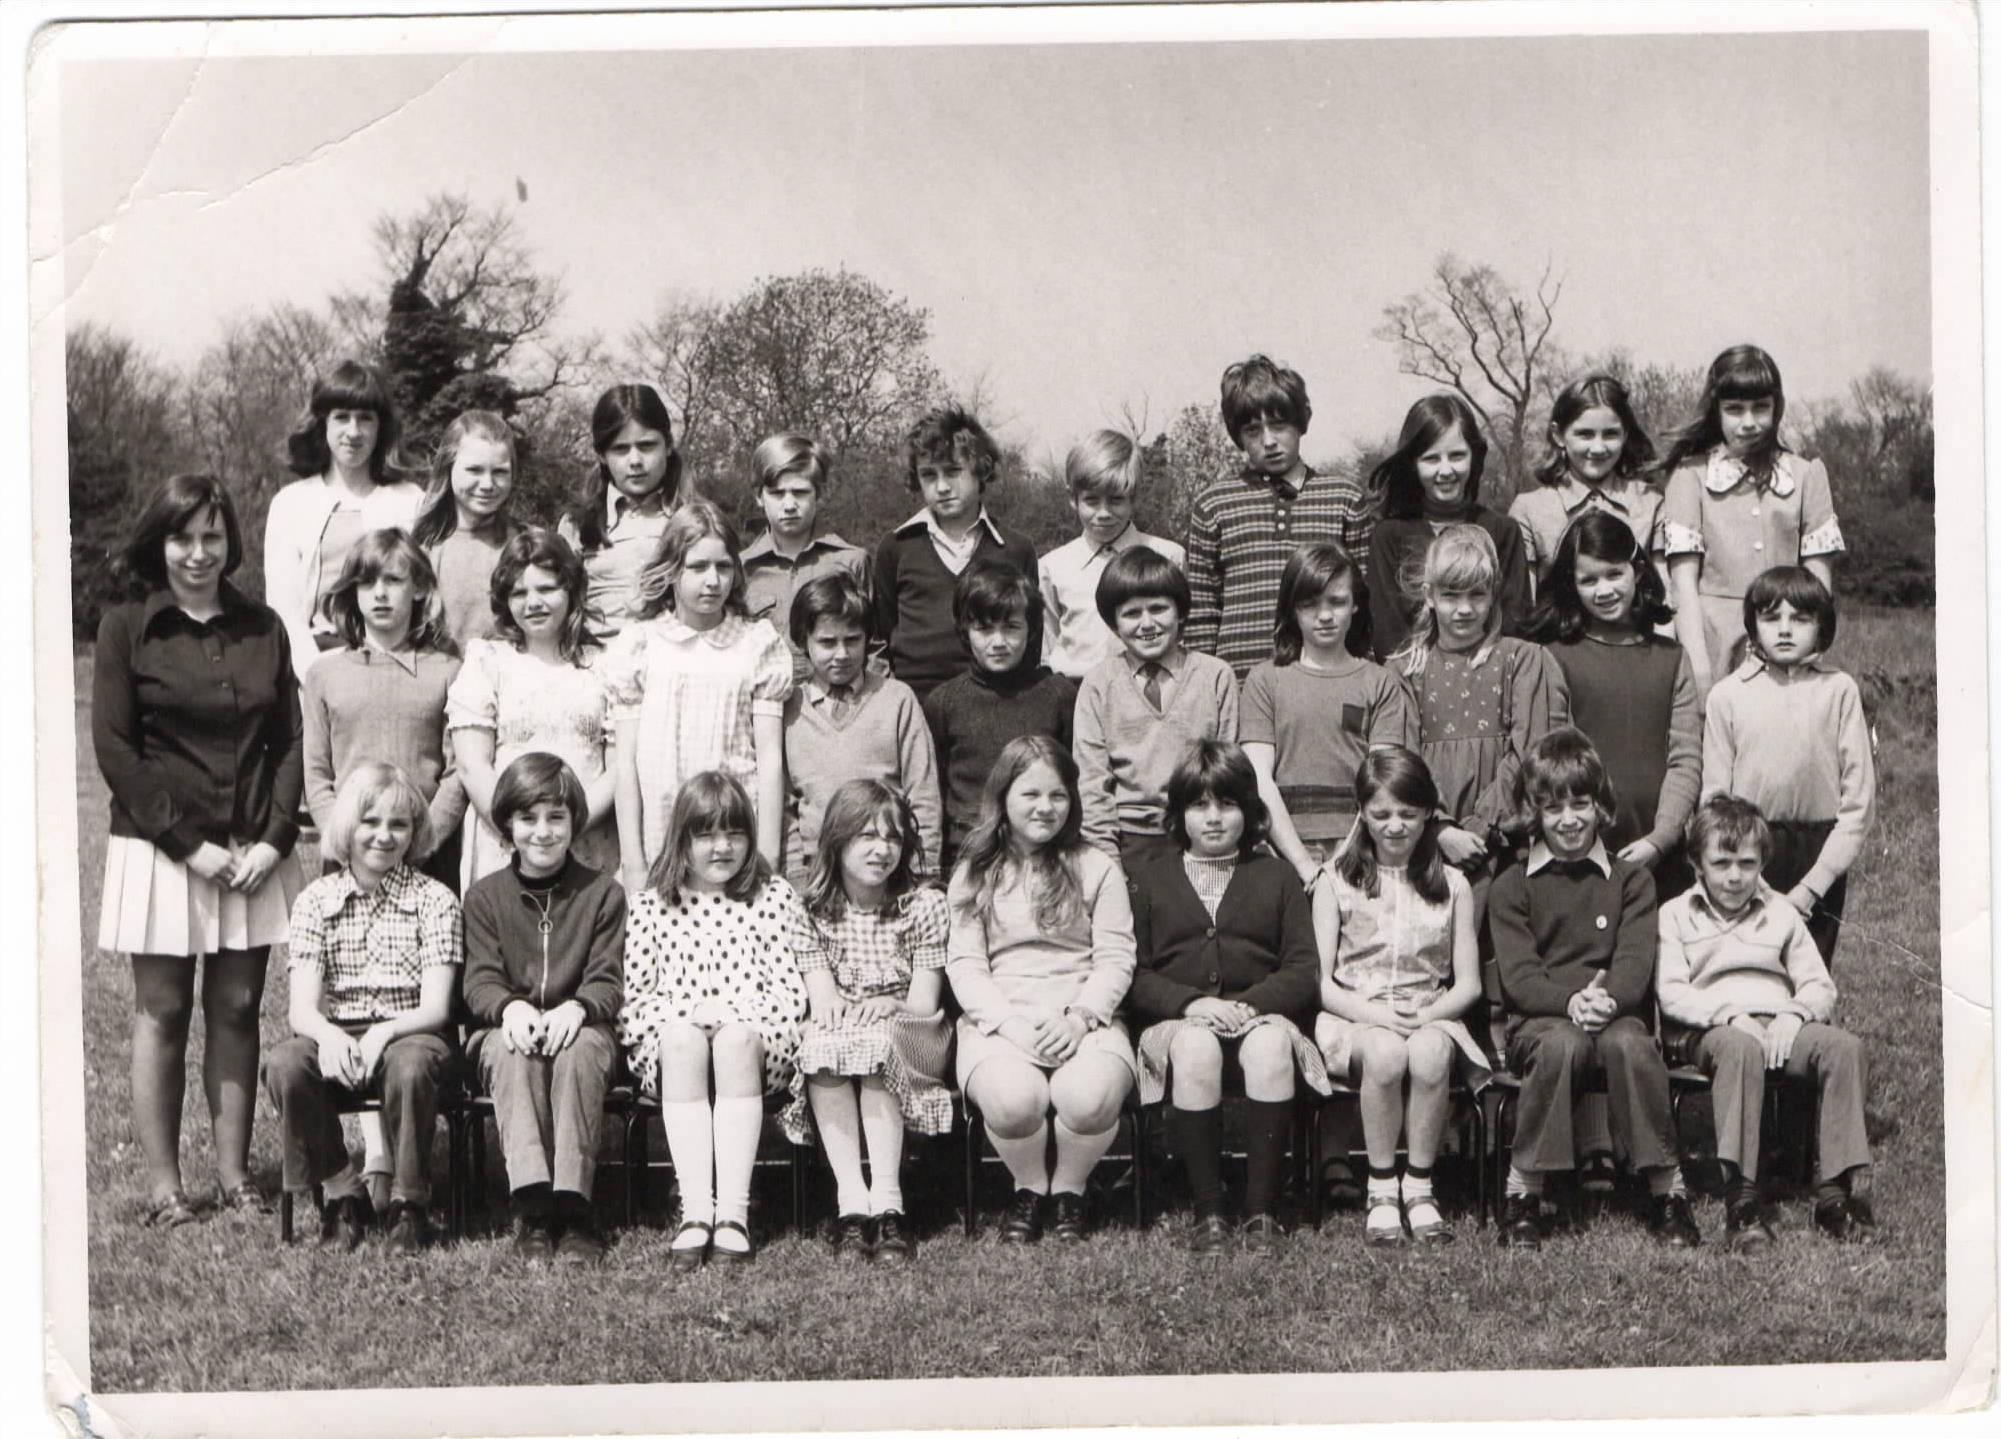 Mrs Gale's class, Chrishall School 1975